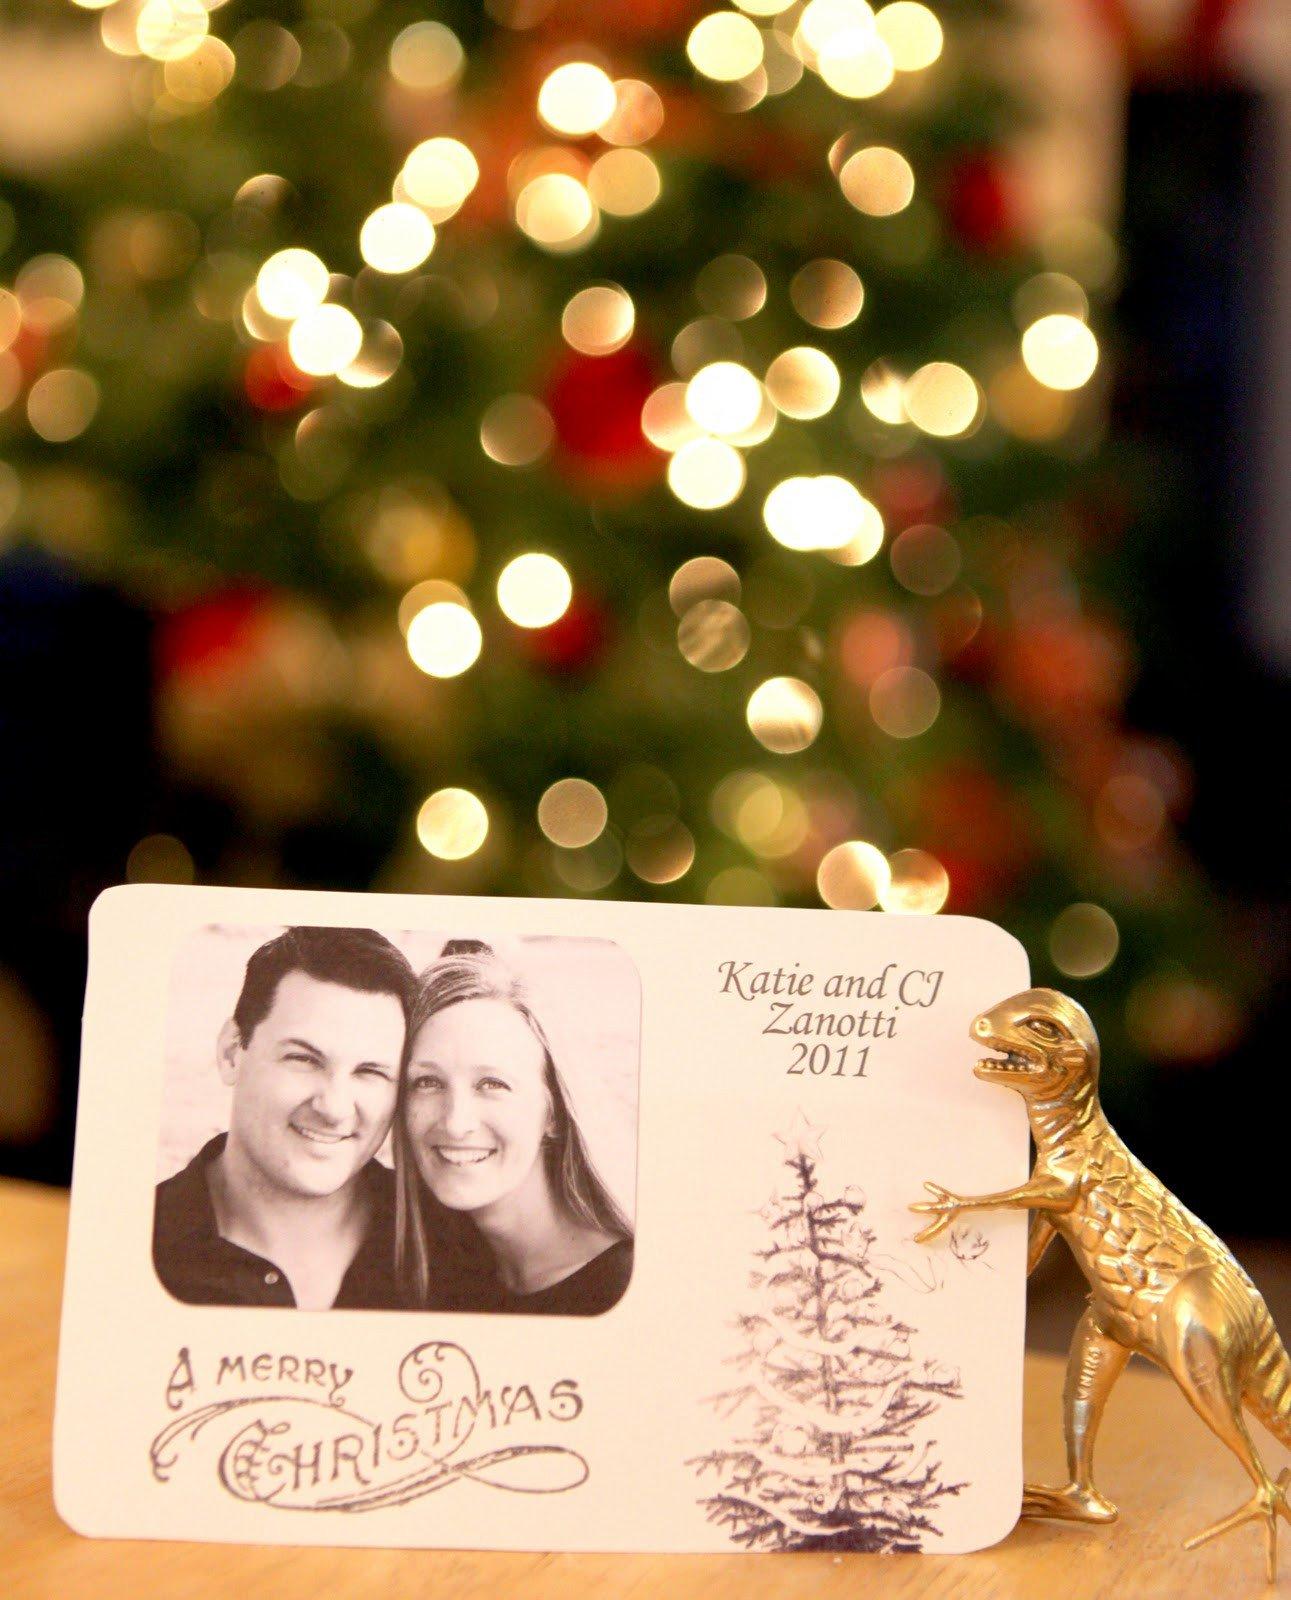 Photoshop Christmas Card Templates Chloe Moore Graphy the Blog Free Christmas Card